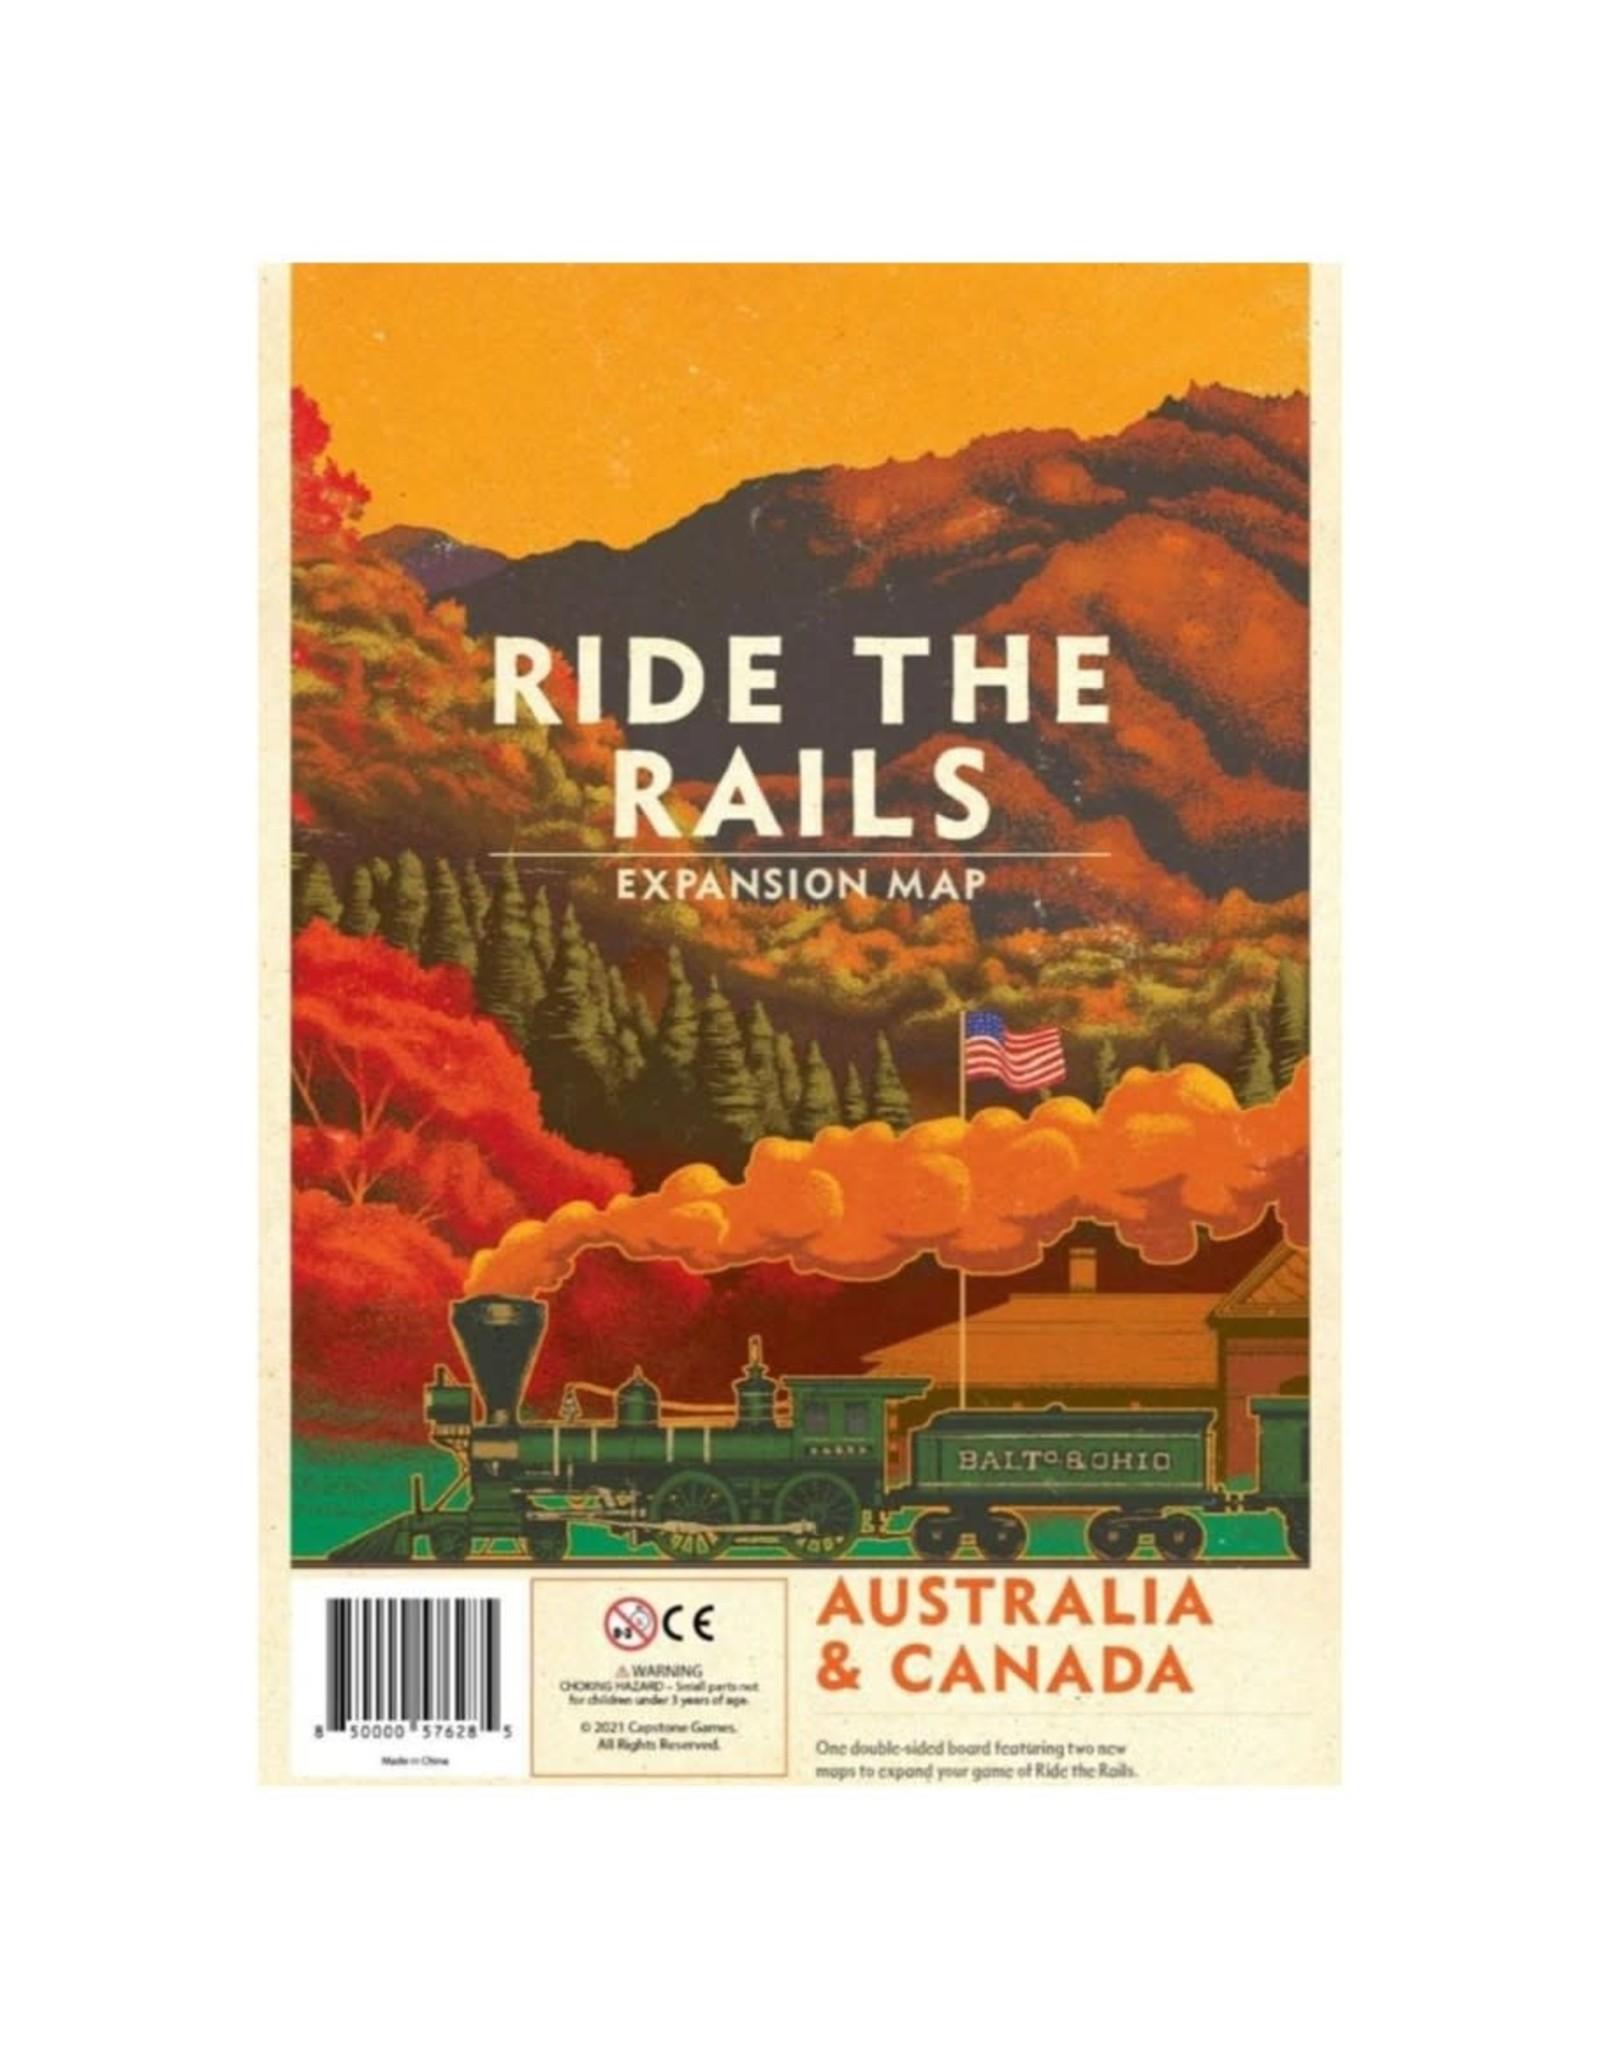 Capstone Australia & Canada Map Expansion - Ride the Rails